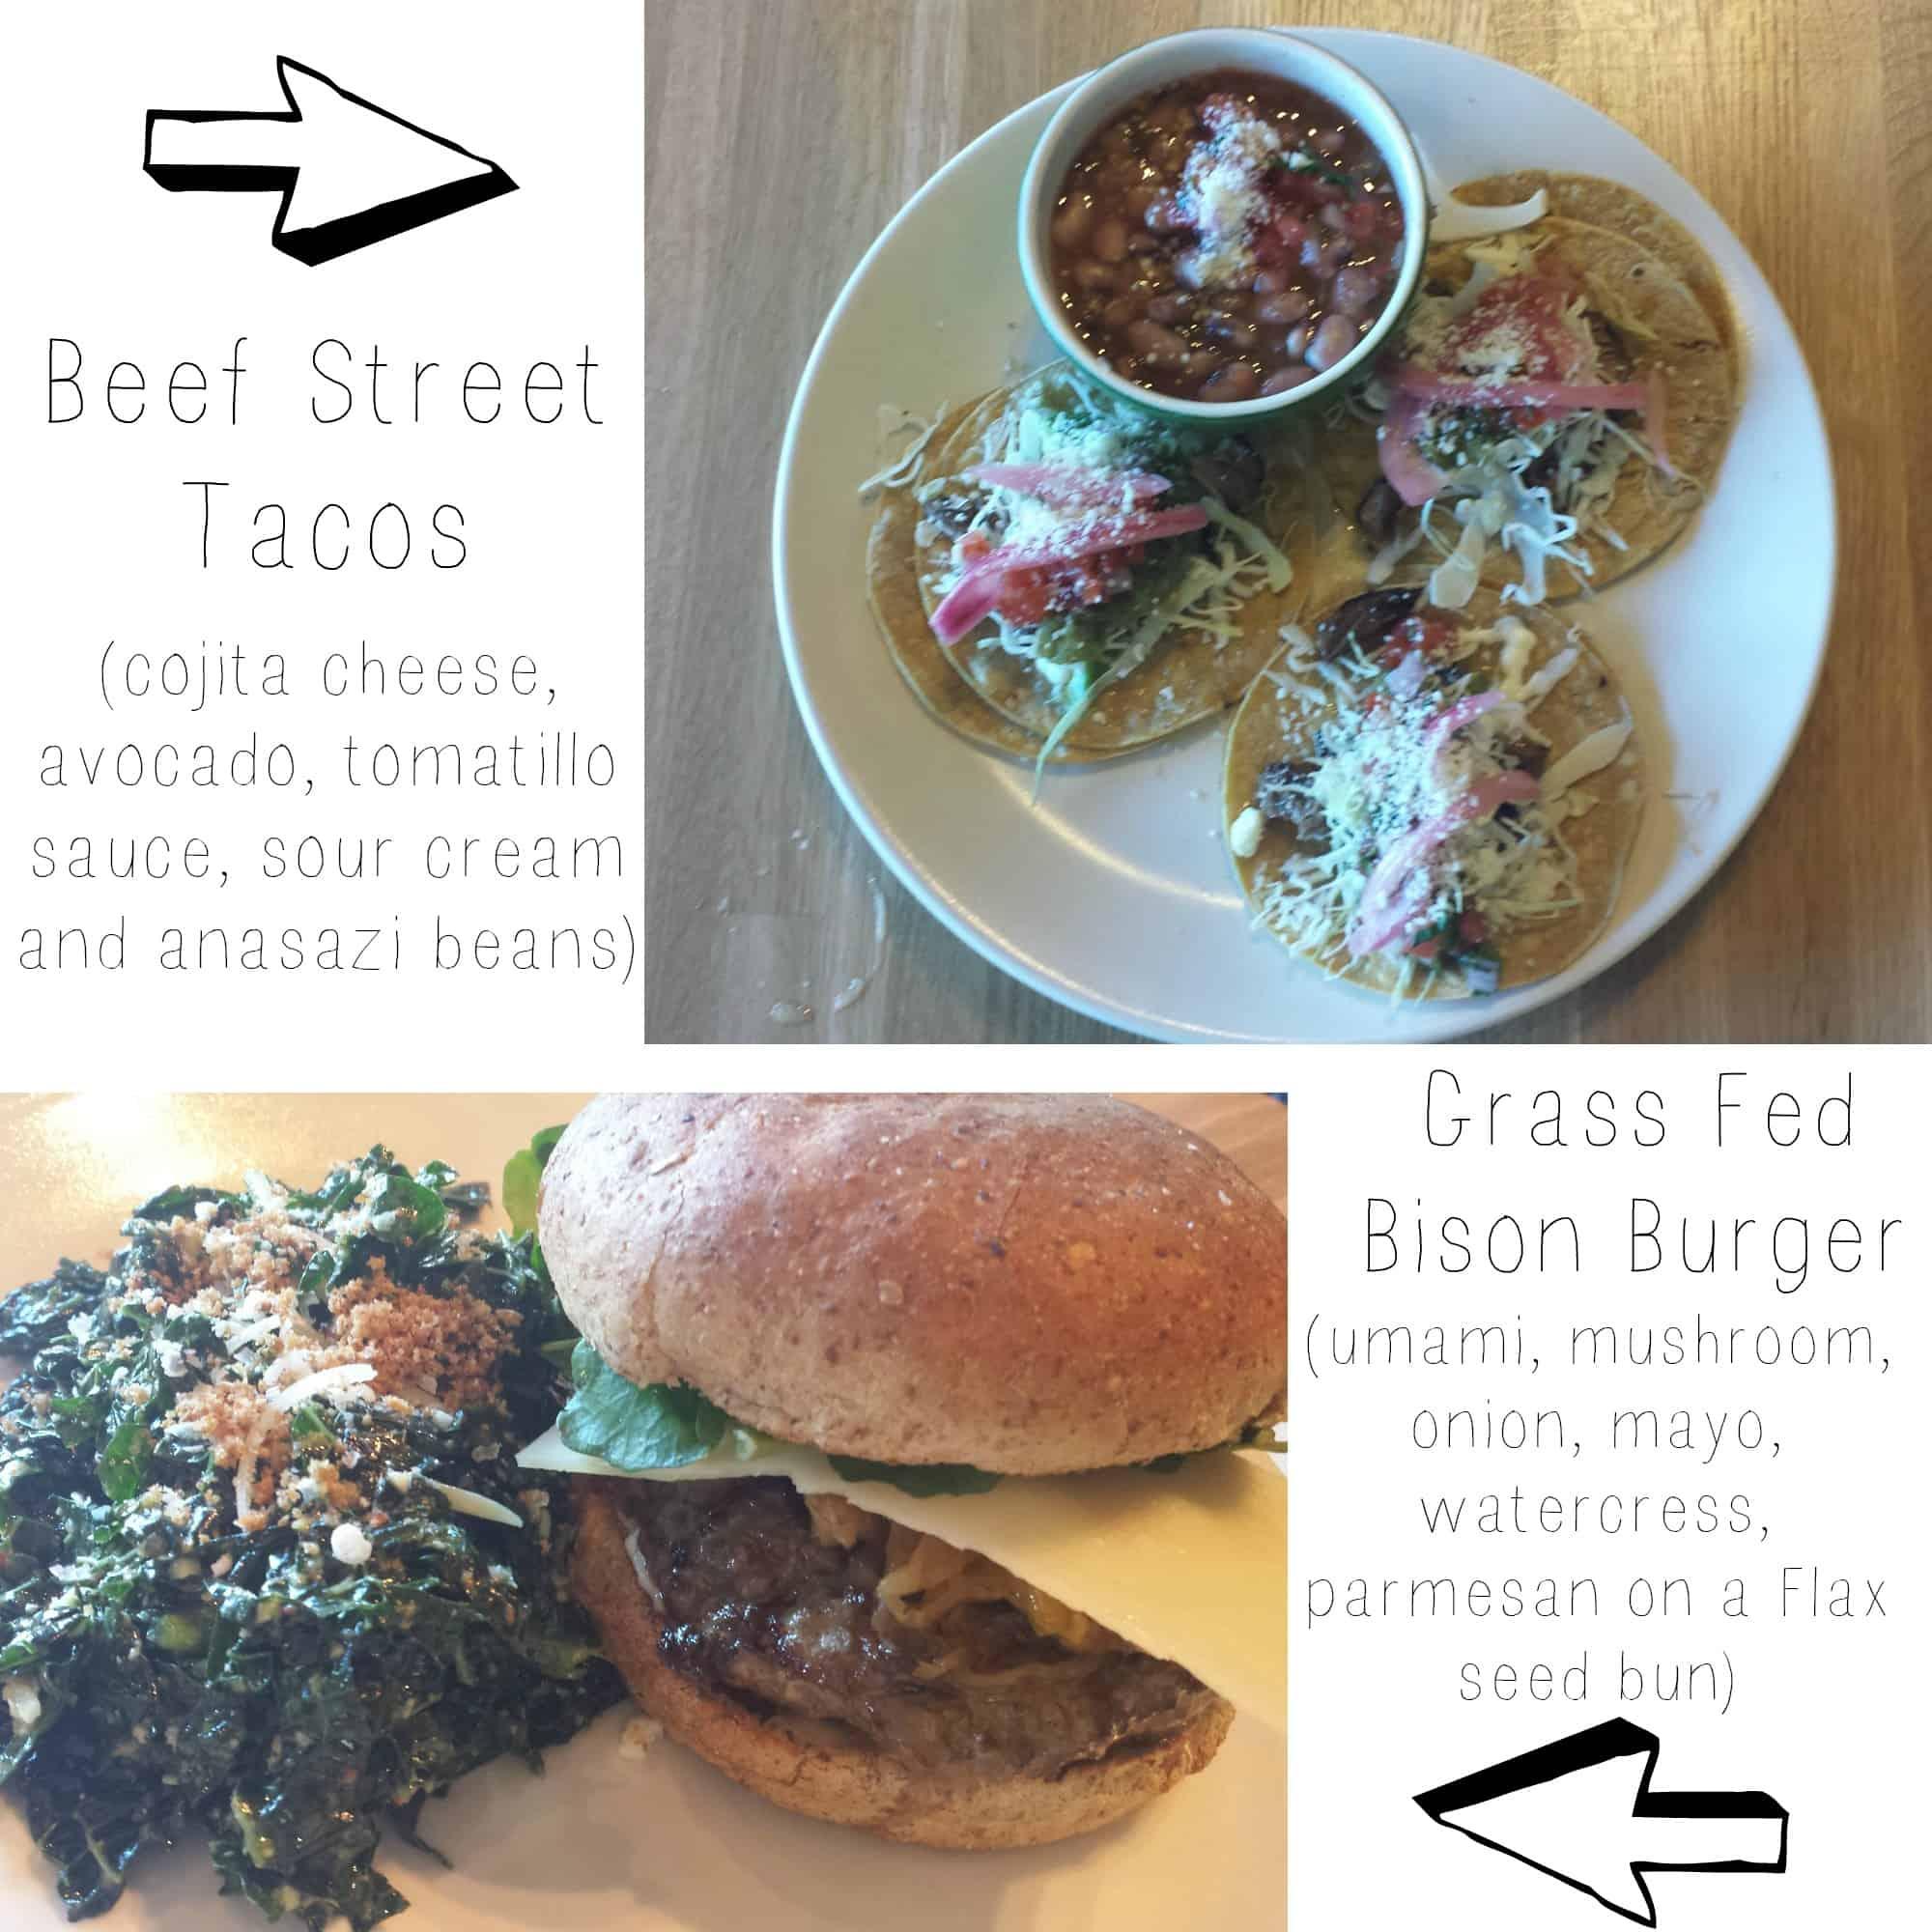 True Food Kitchen Dallas Reviews